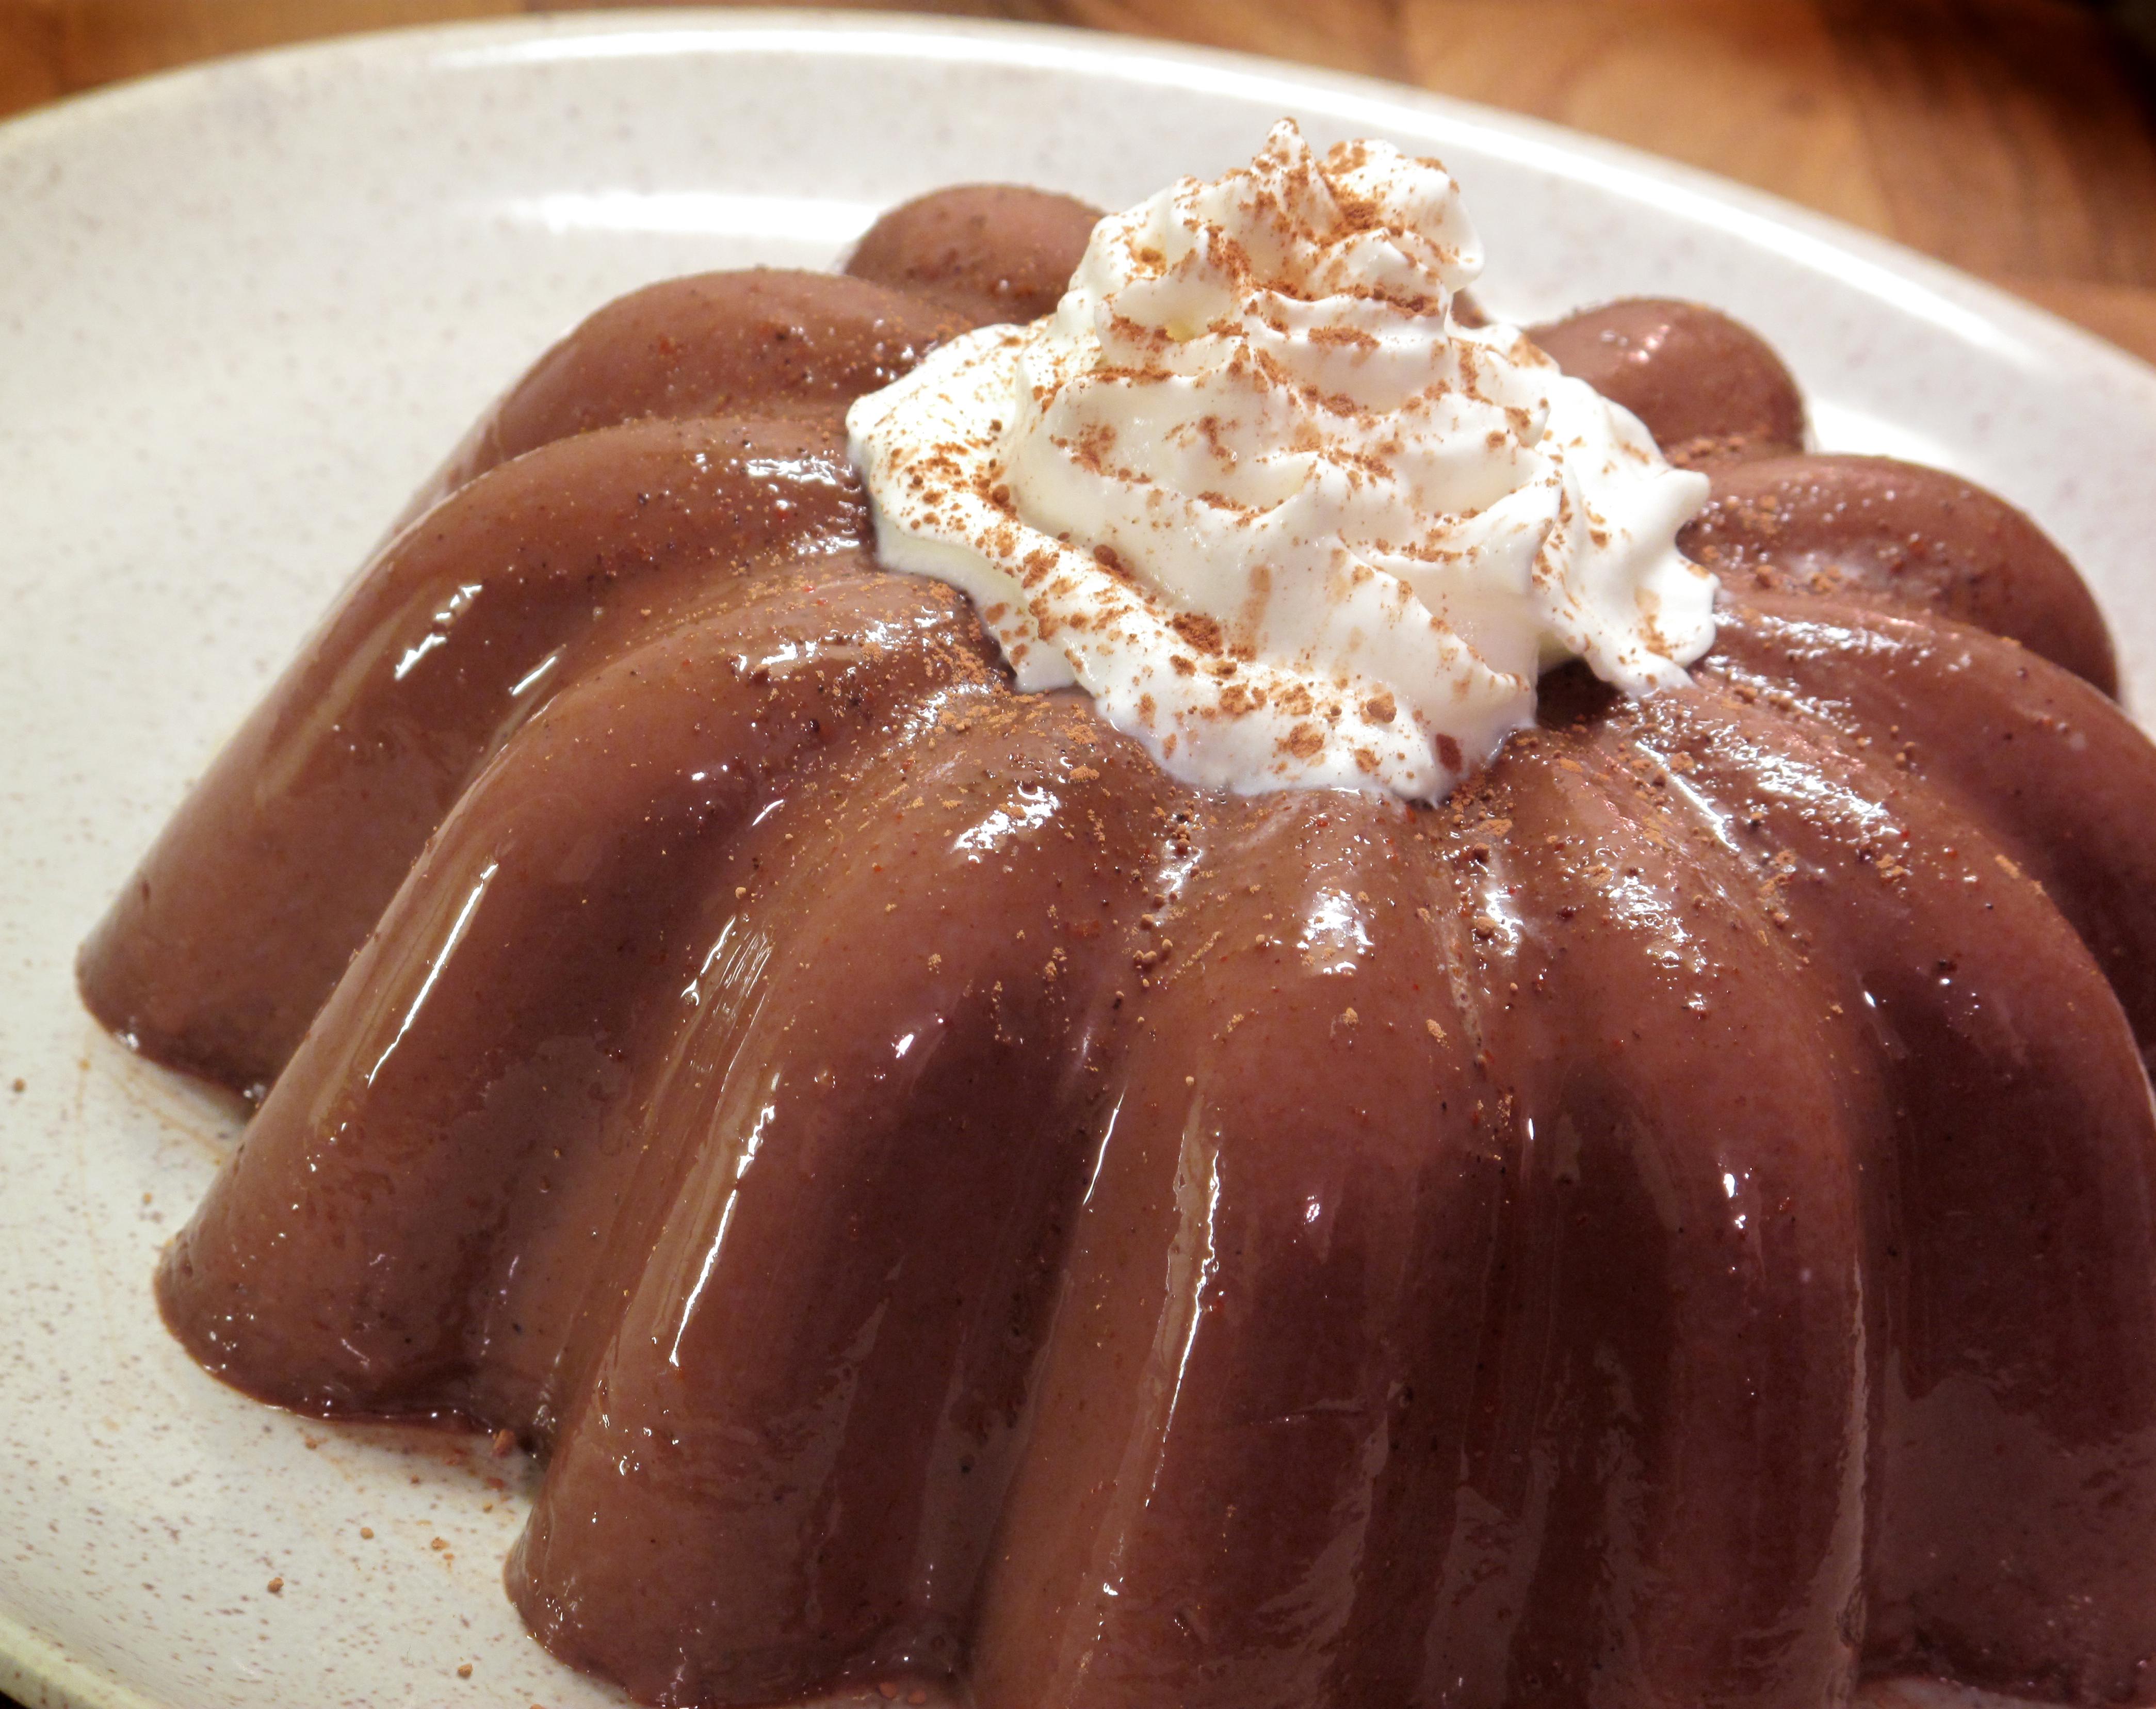 Chocolate | The Jello Mold Mistress of Brooklyn